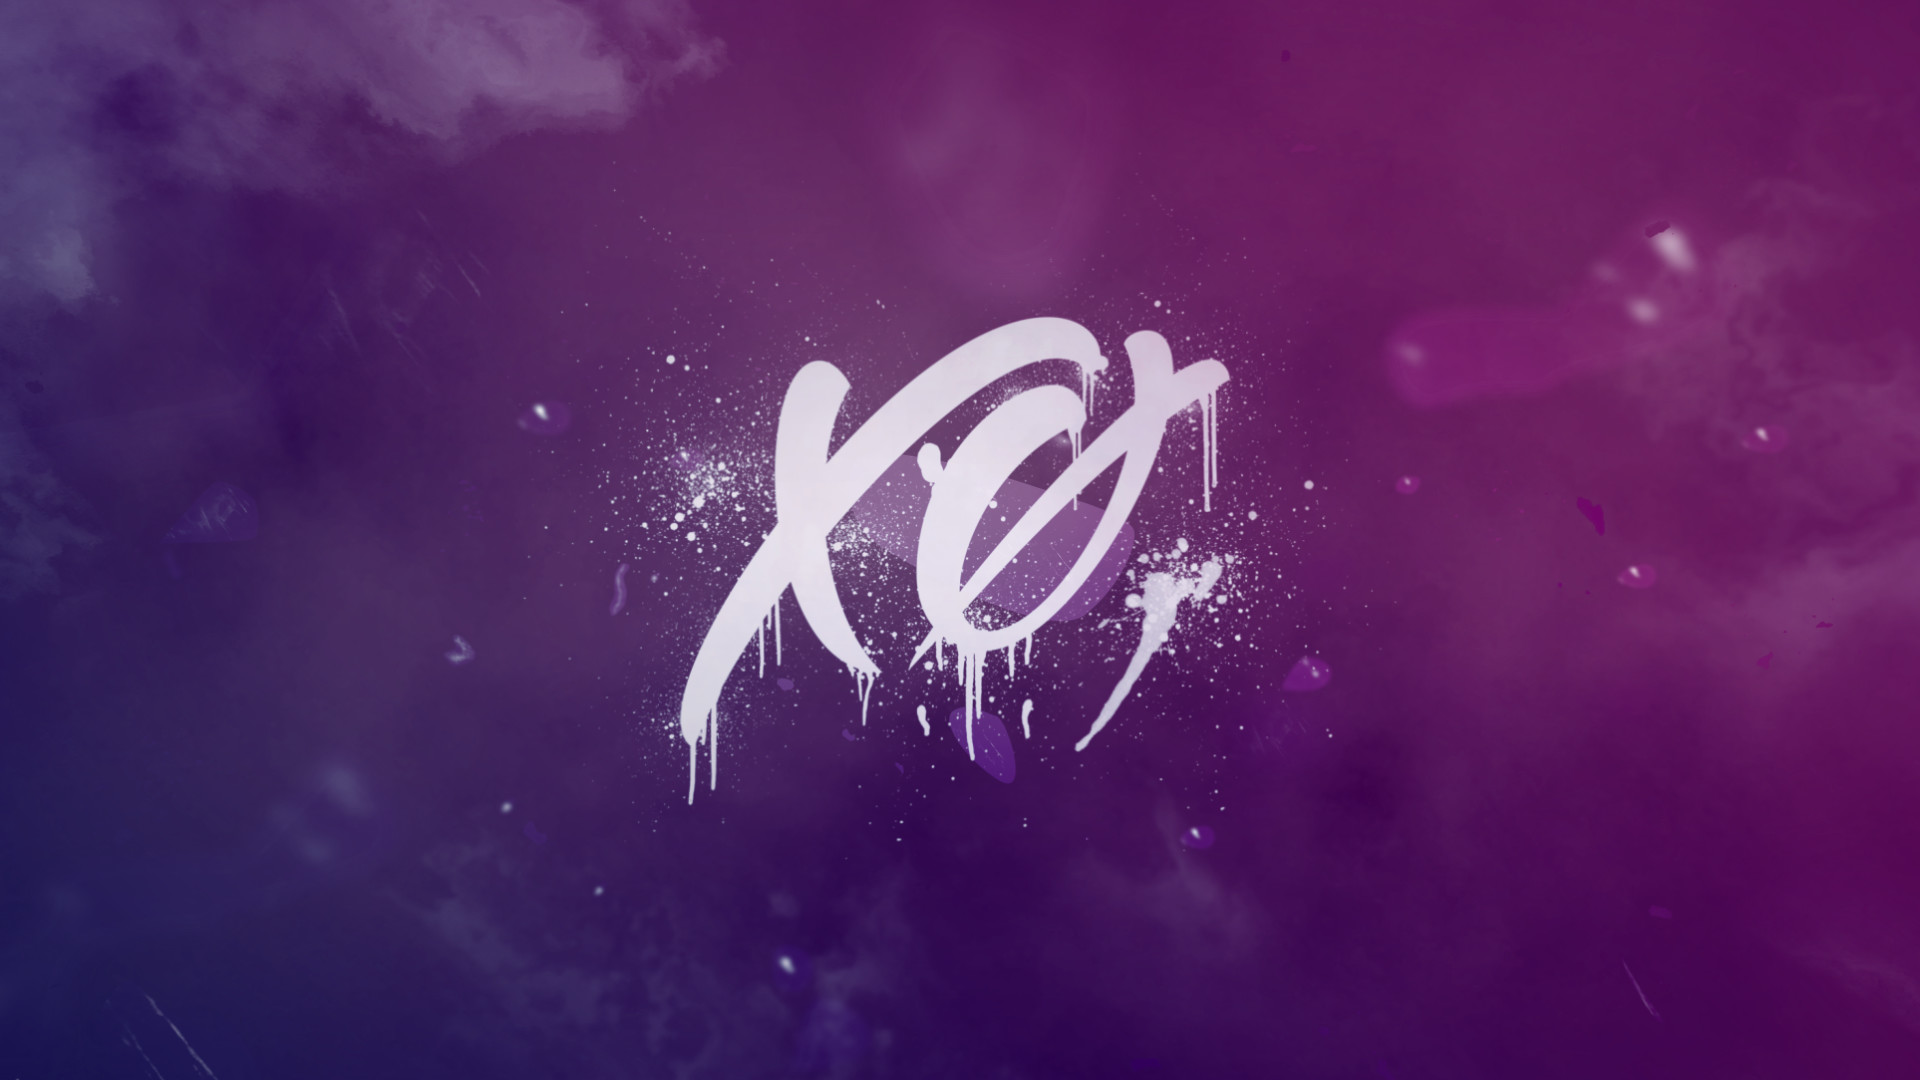 xo wallpaper 74 images